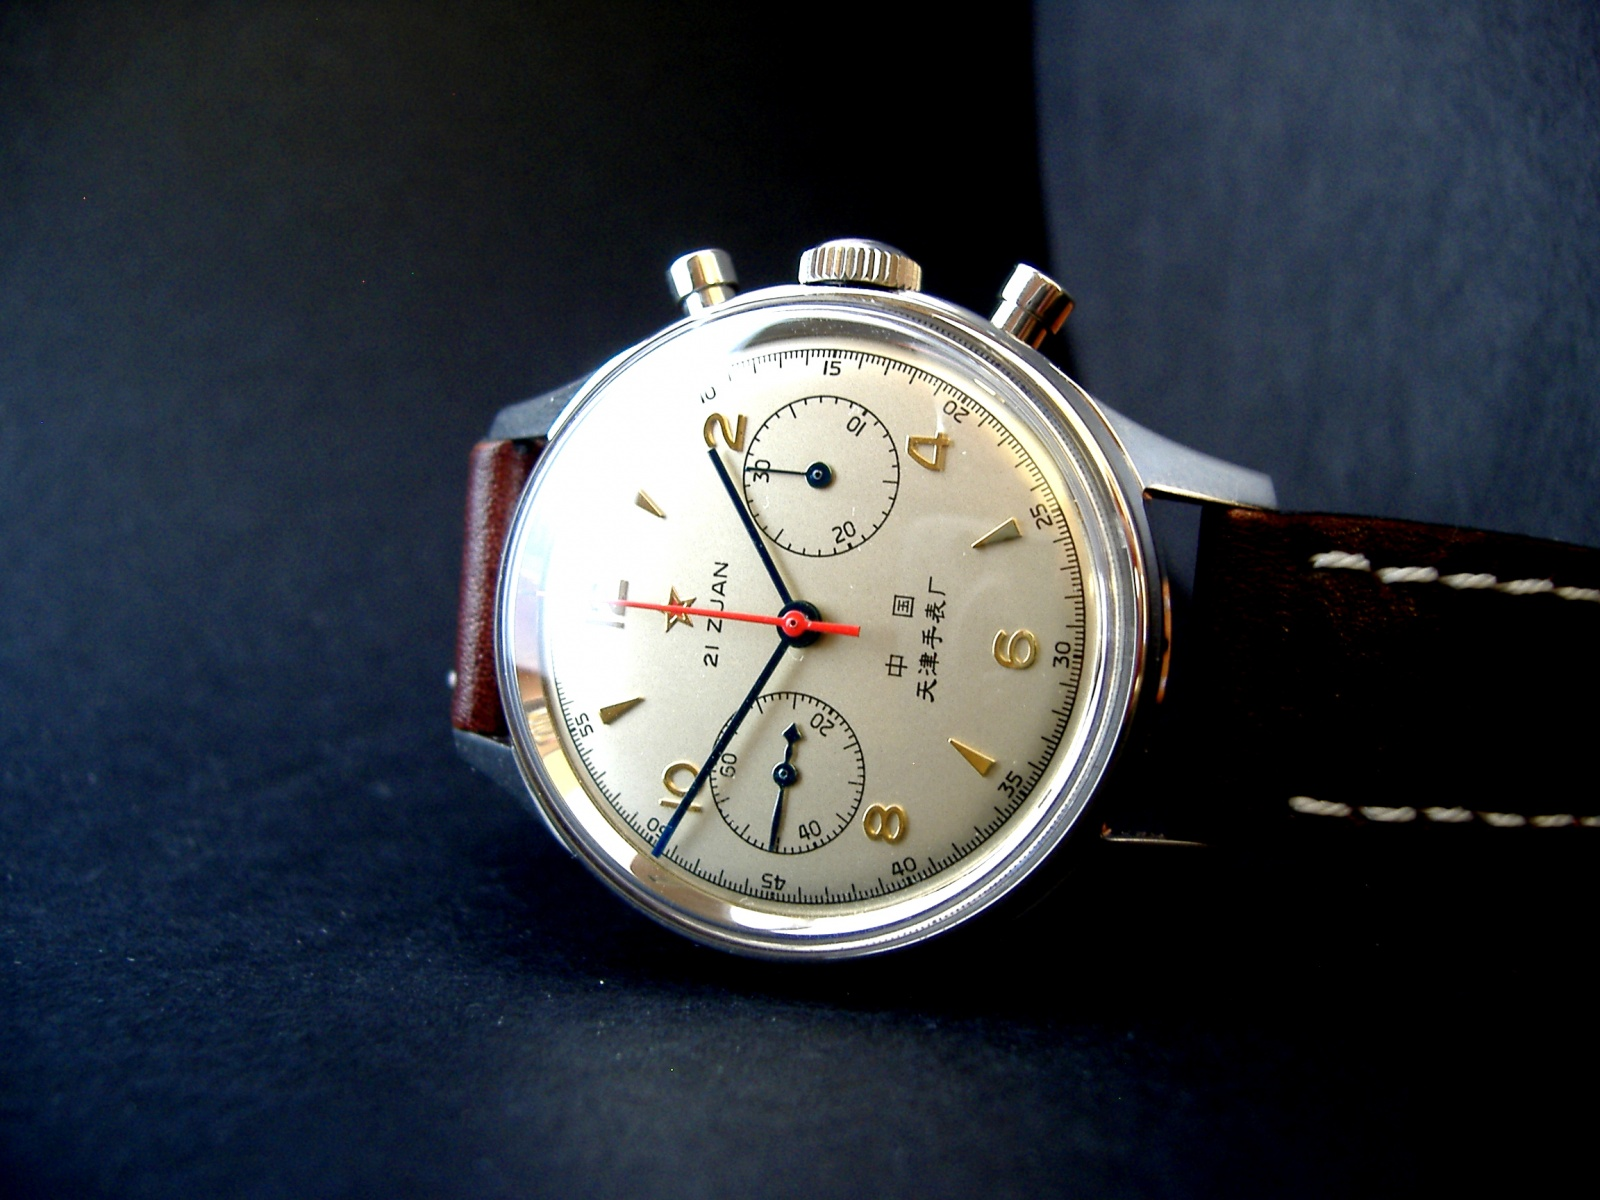 Seagull 1963 1